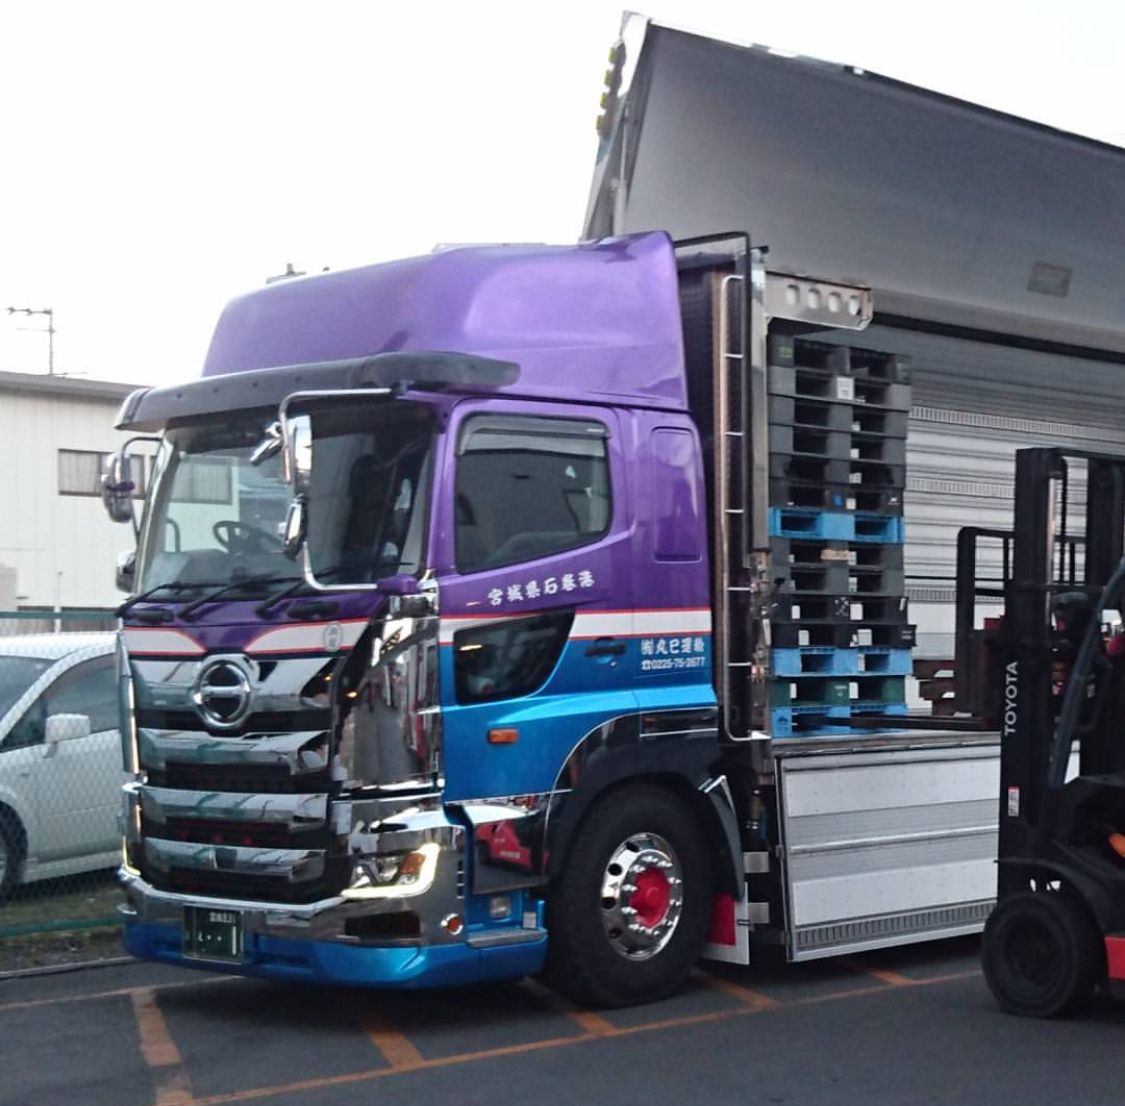 Bus And Truck Custtoms おしゃれまとめの人気アイデア Pinterest Kazu 日野 自動車 デコトラ トラック野郎